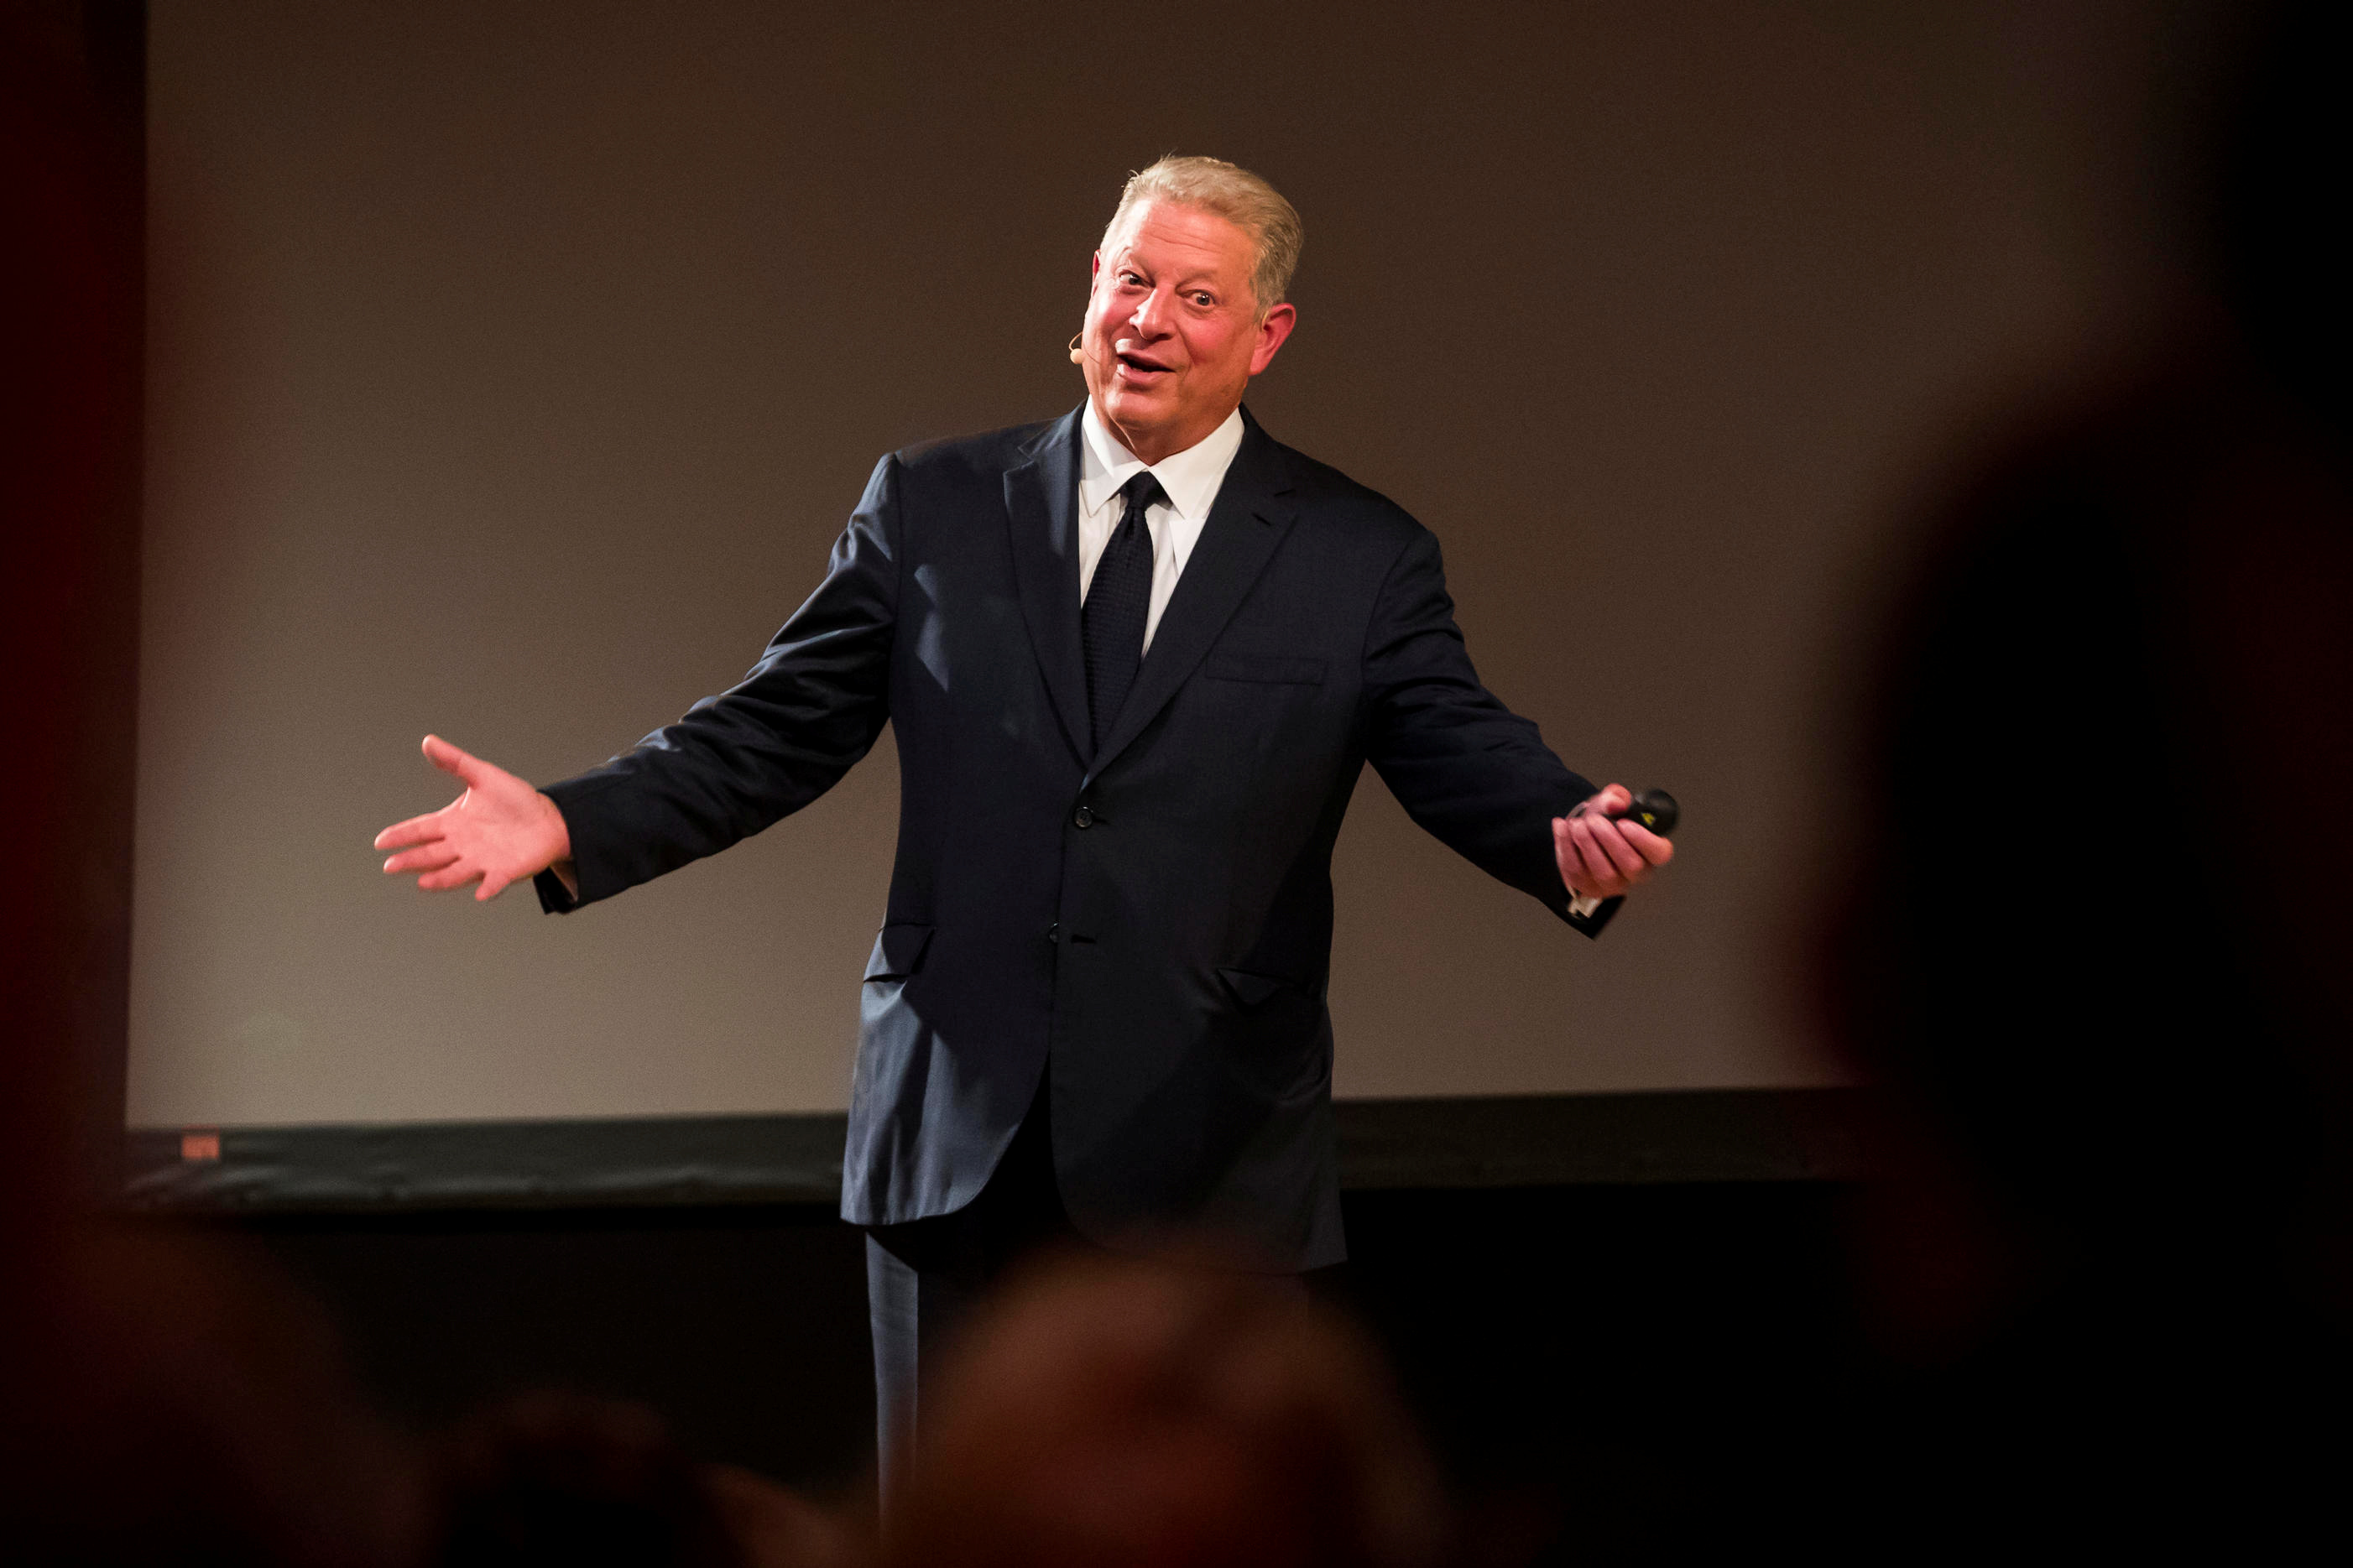 Al Gore, U.S. former Vice President and Nobel Peace Prize winner, speaks at the Grieginvestor conference in Oslo, Norway November 7, 2018. Heiko Junge/NTB Scanpix/via REUTERS